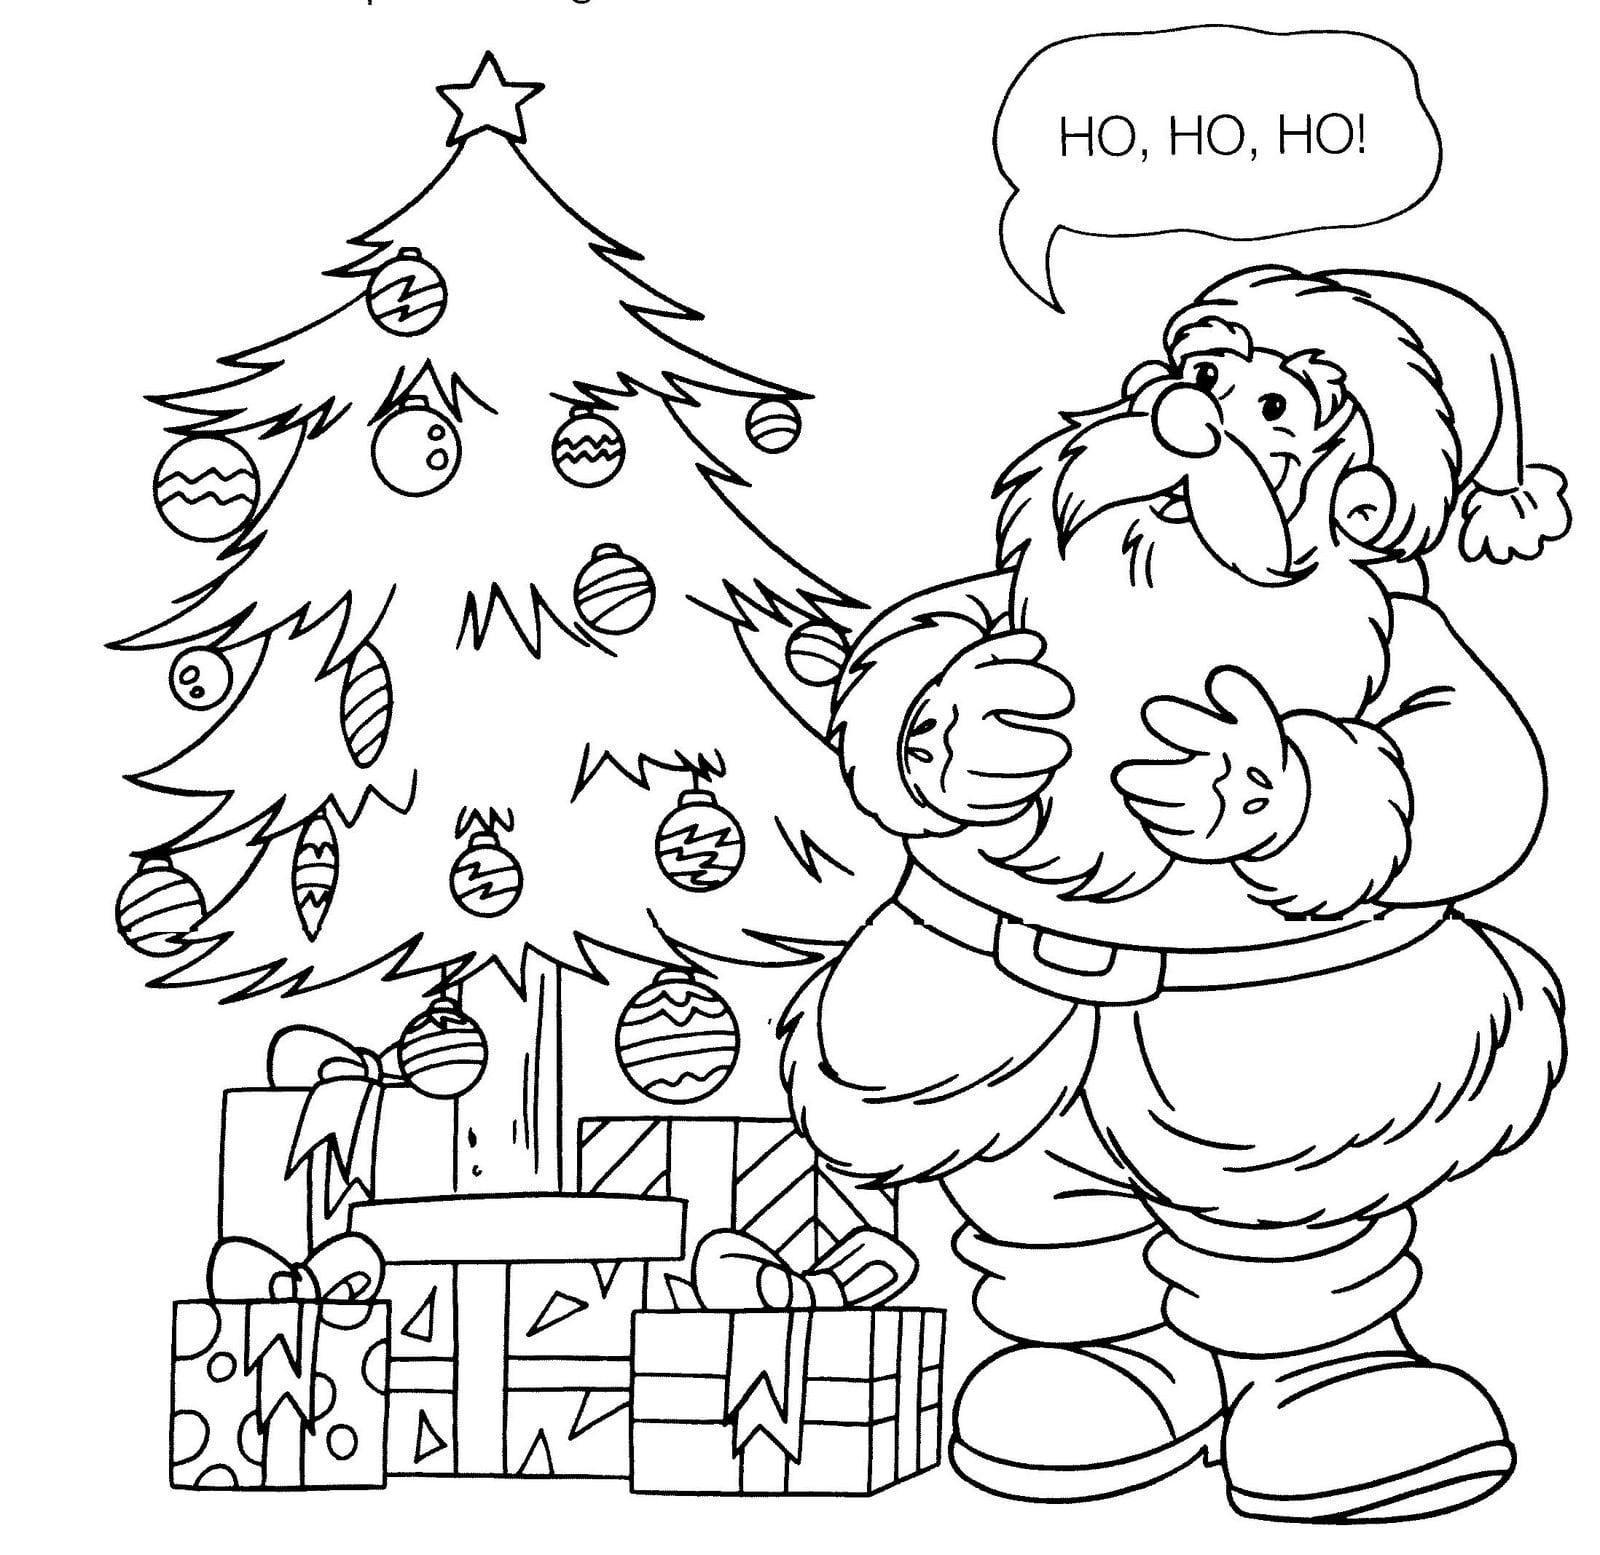 15 Desenhos De Papai Noel Para Colorir E Imprimir